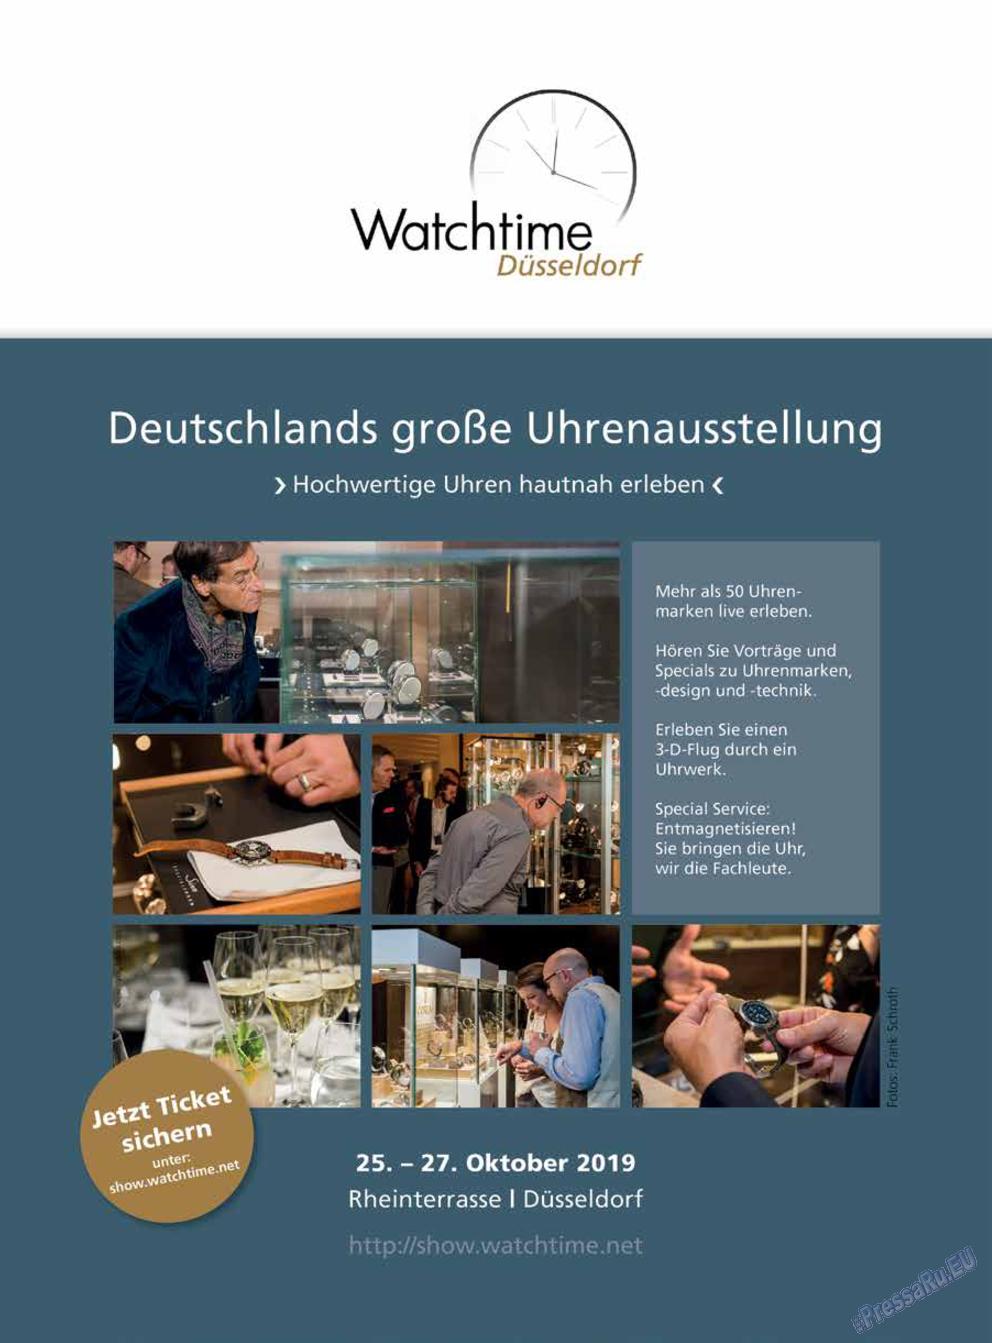 Life in Франкфурт (журнал). 2019 год, номер 44, стр. 55